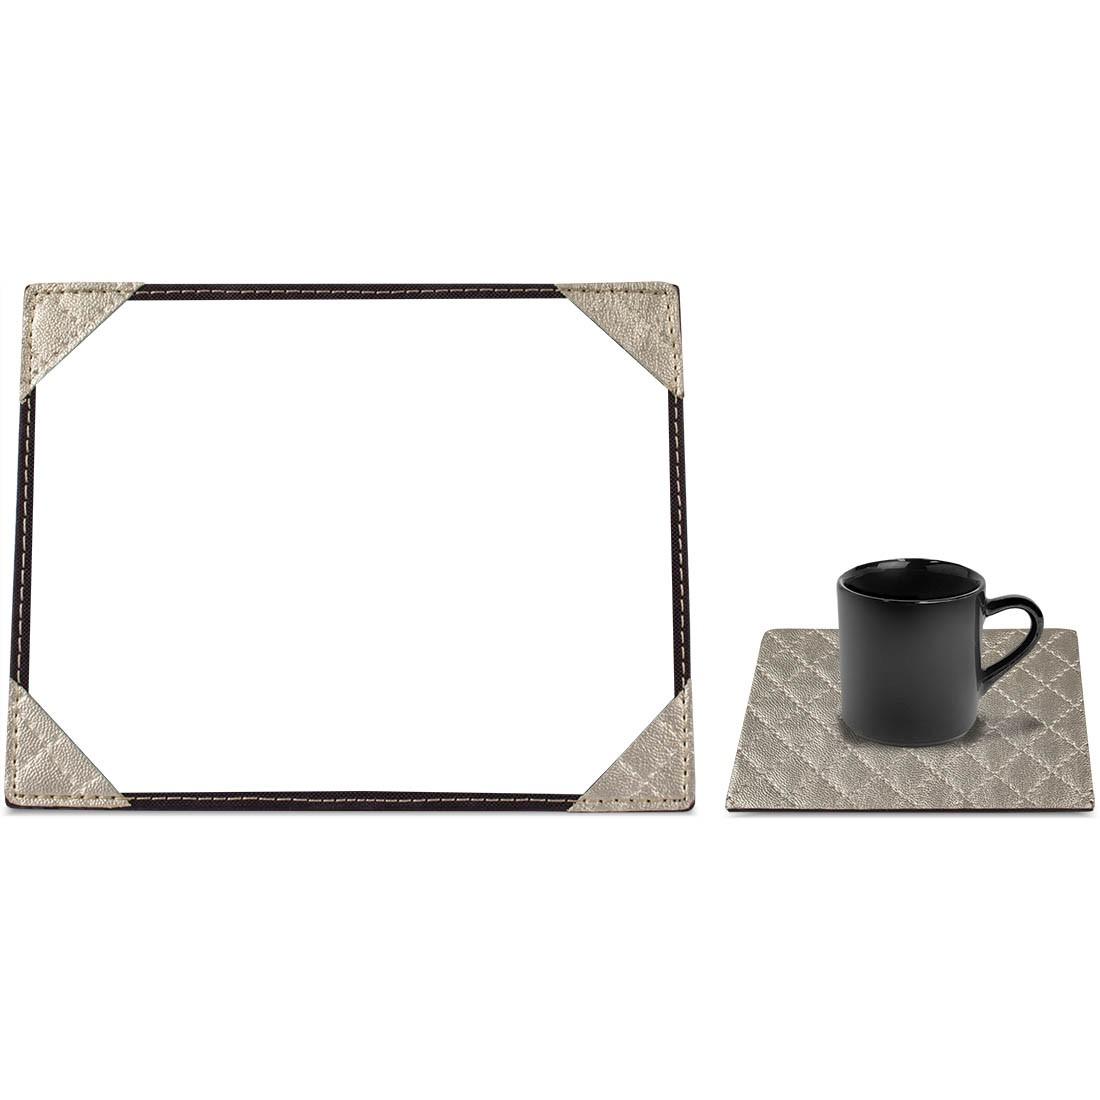 Porta Retrato Risque Rabisque e Porta Espelho